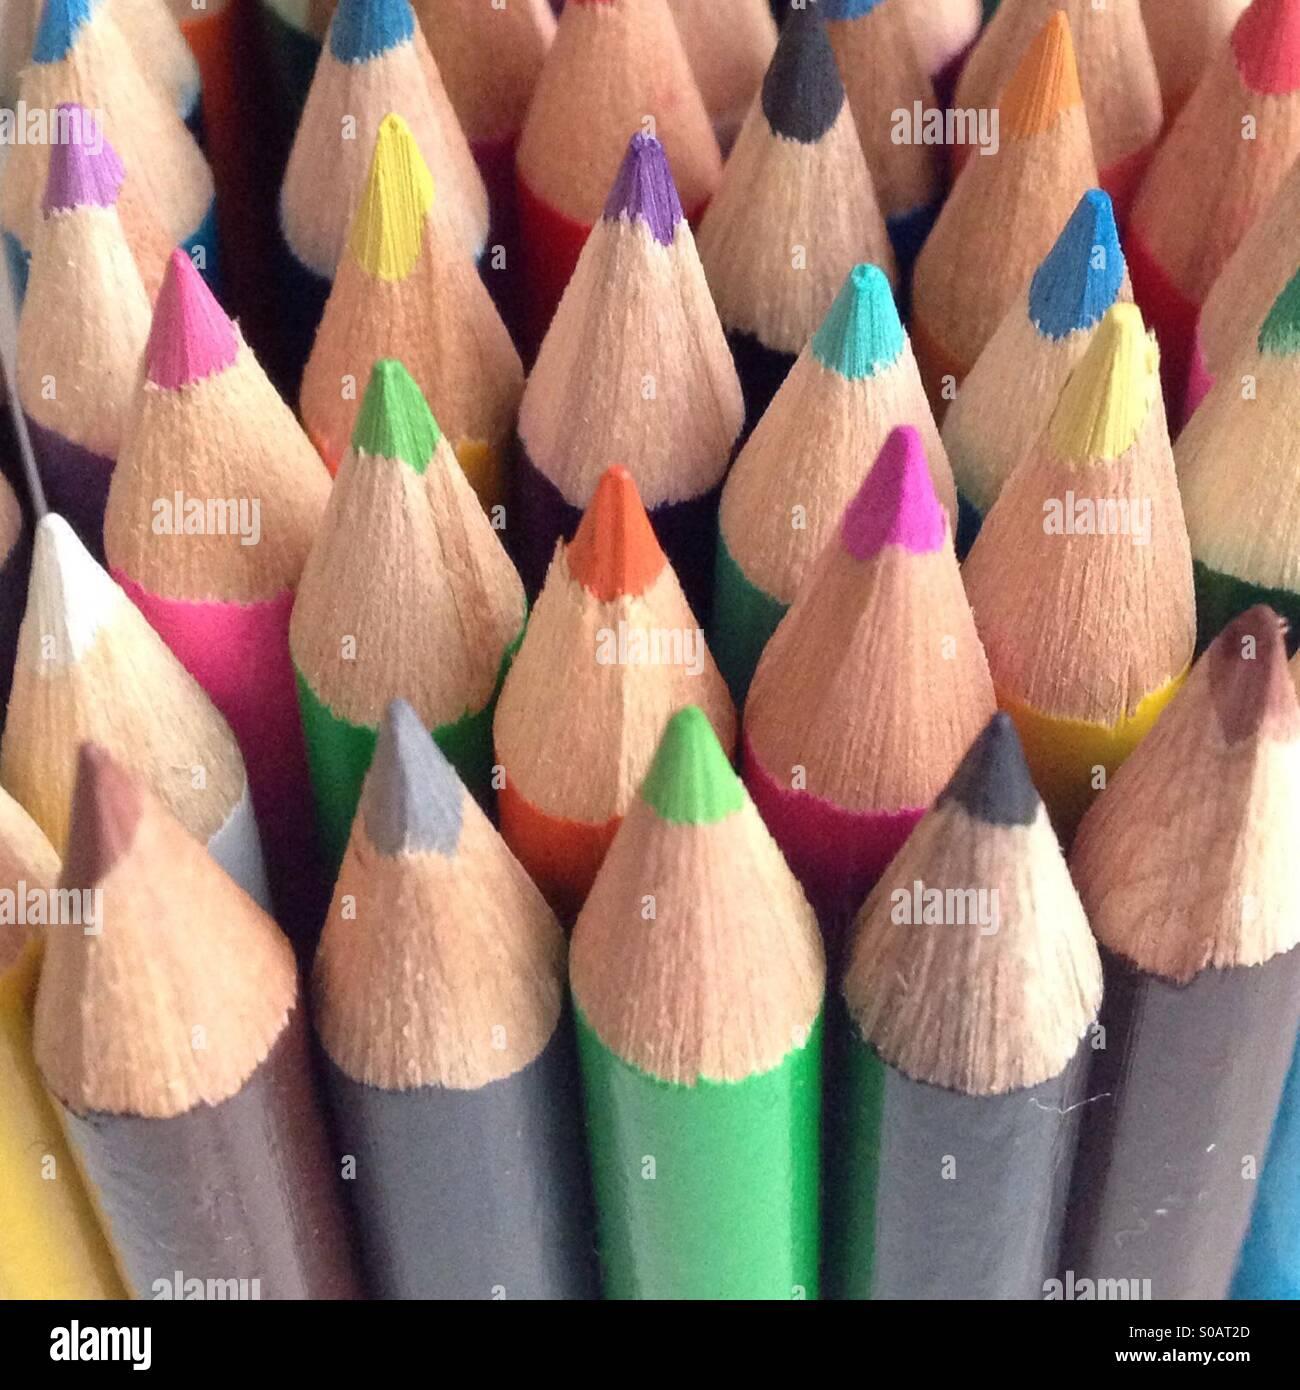 Toutes les couleurs ensemble Photo Stock